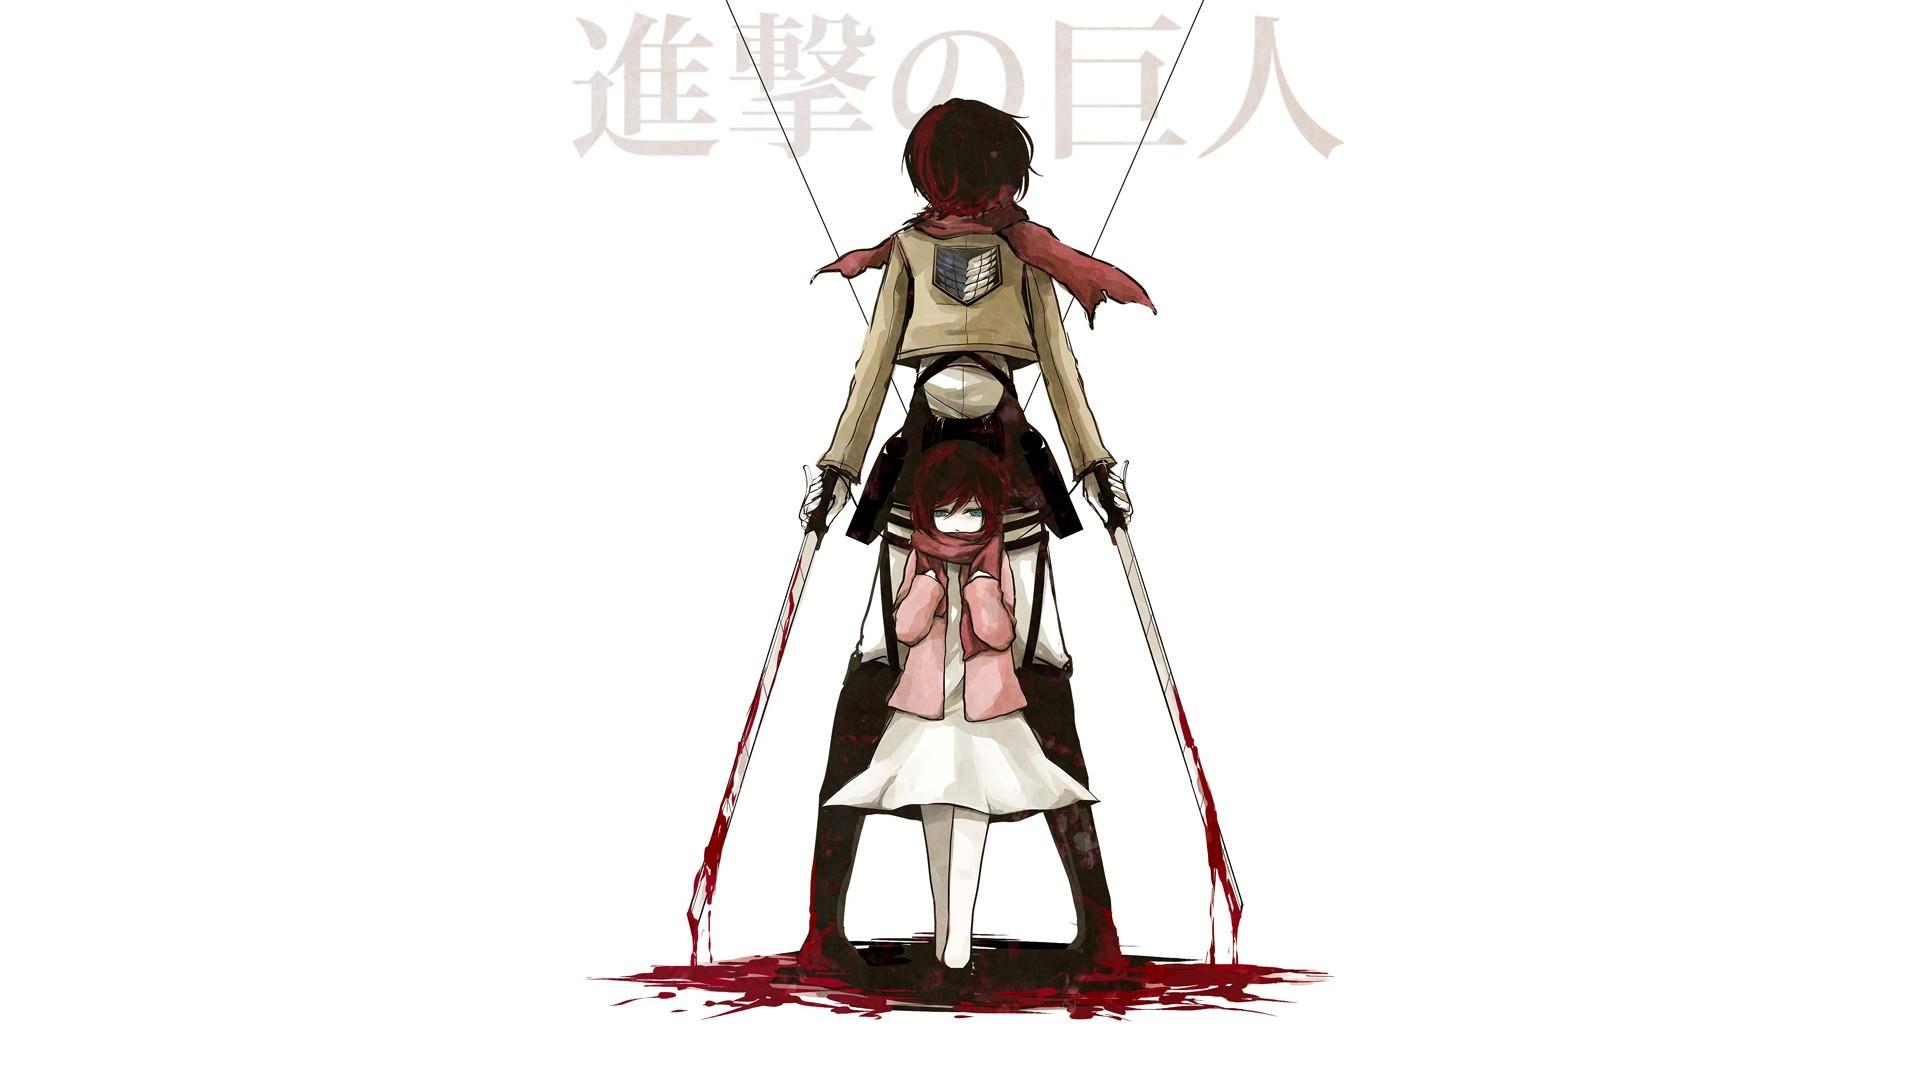 Shingeki No Kyojin Mikasa Ackerman Hd Wallpaper Background Image 1920x1080 Id 607897 Wallpaper Abyss